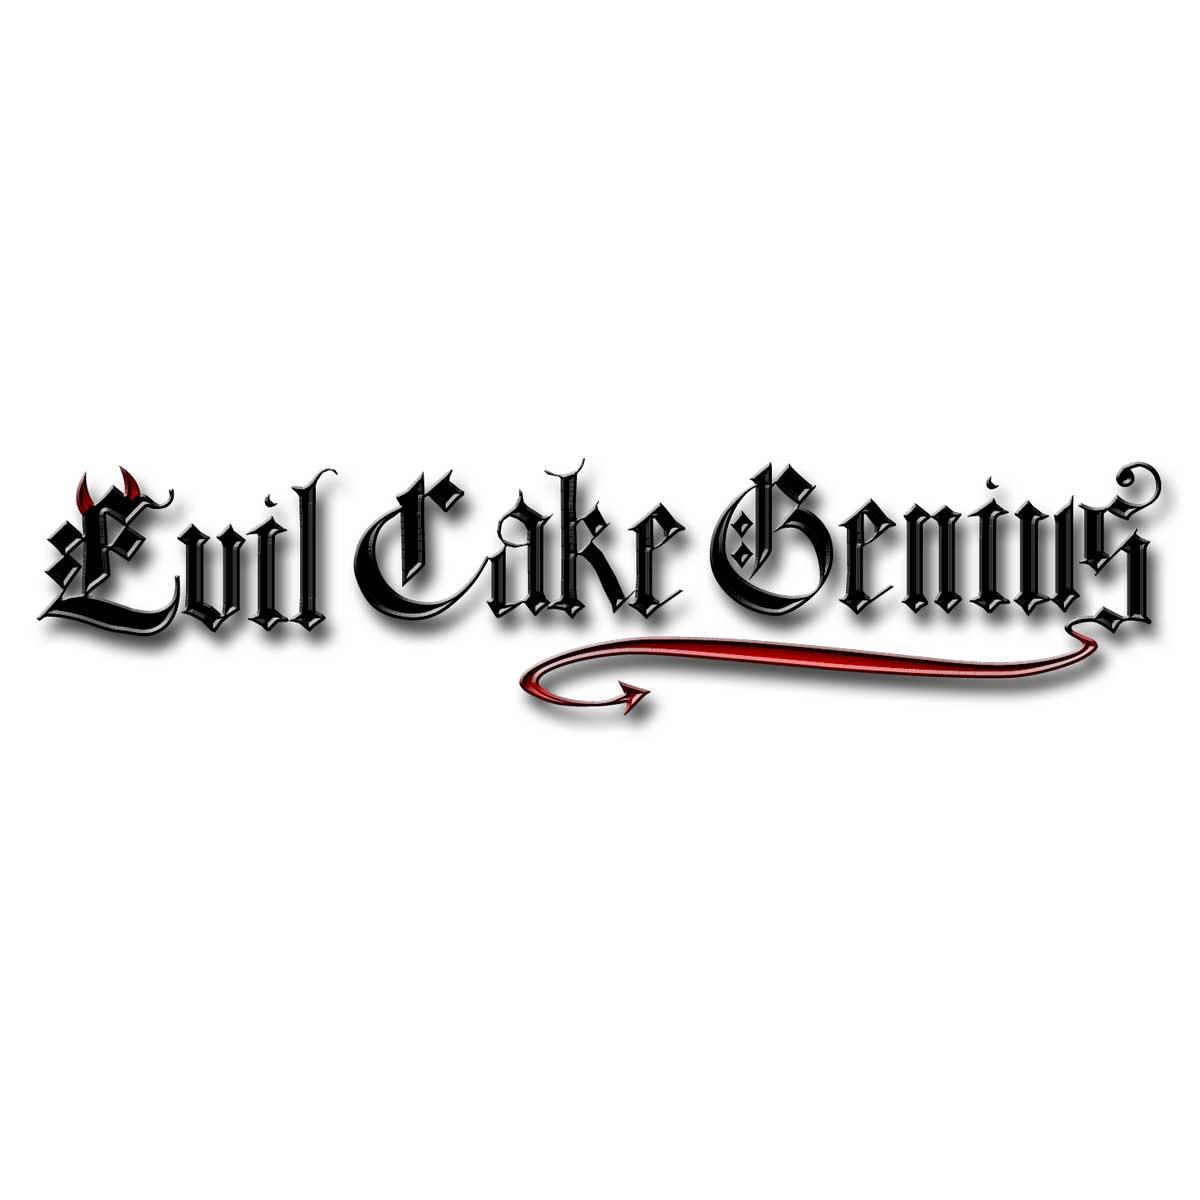 Fox and Raccoon Cookie Set - Evil Cake Genius